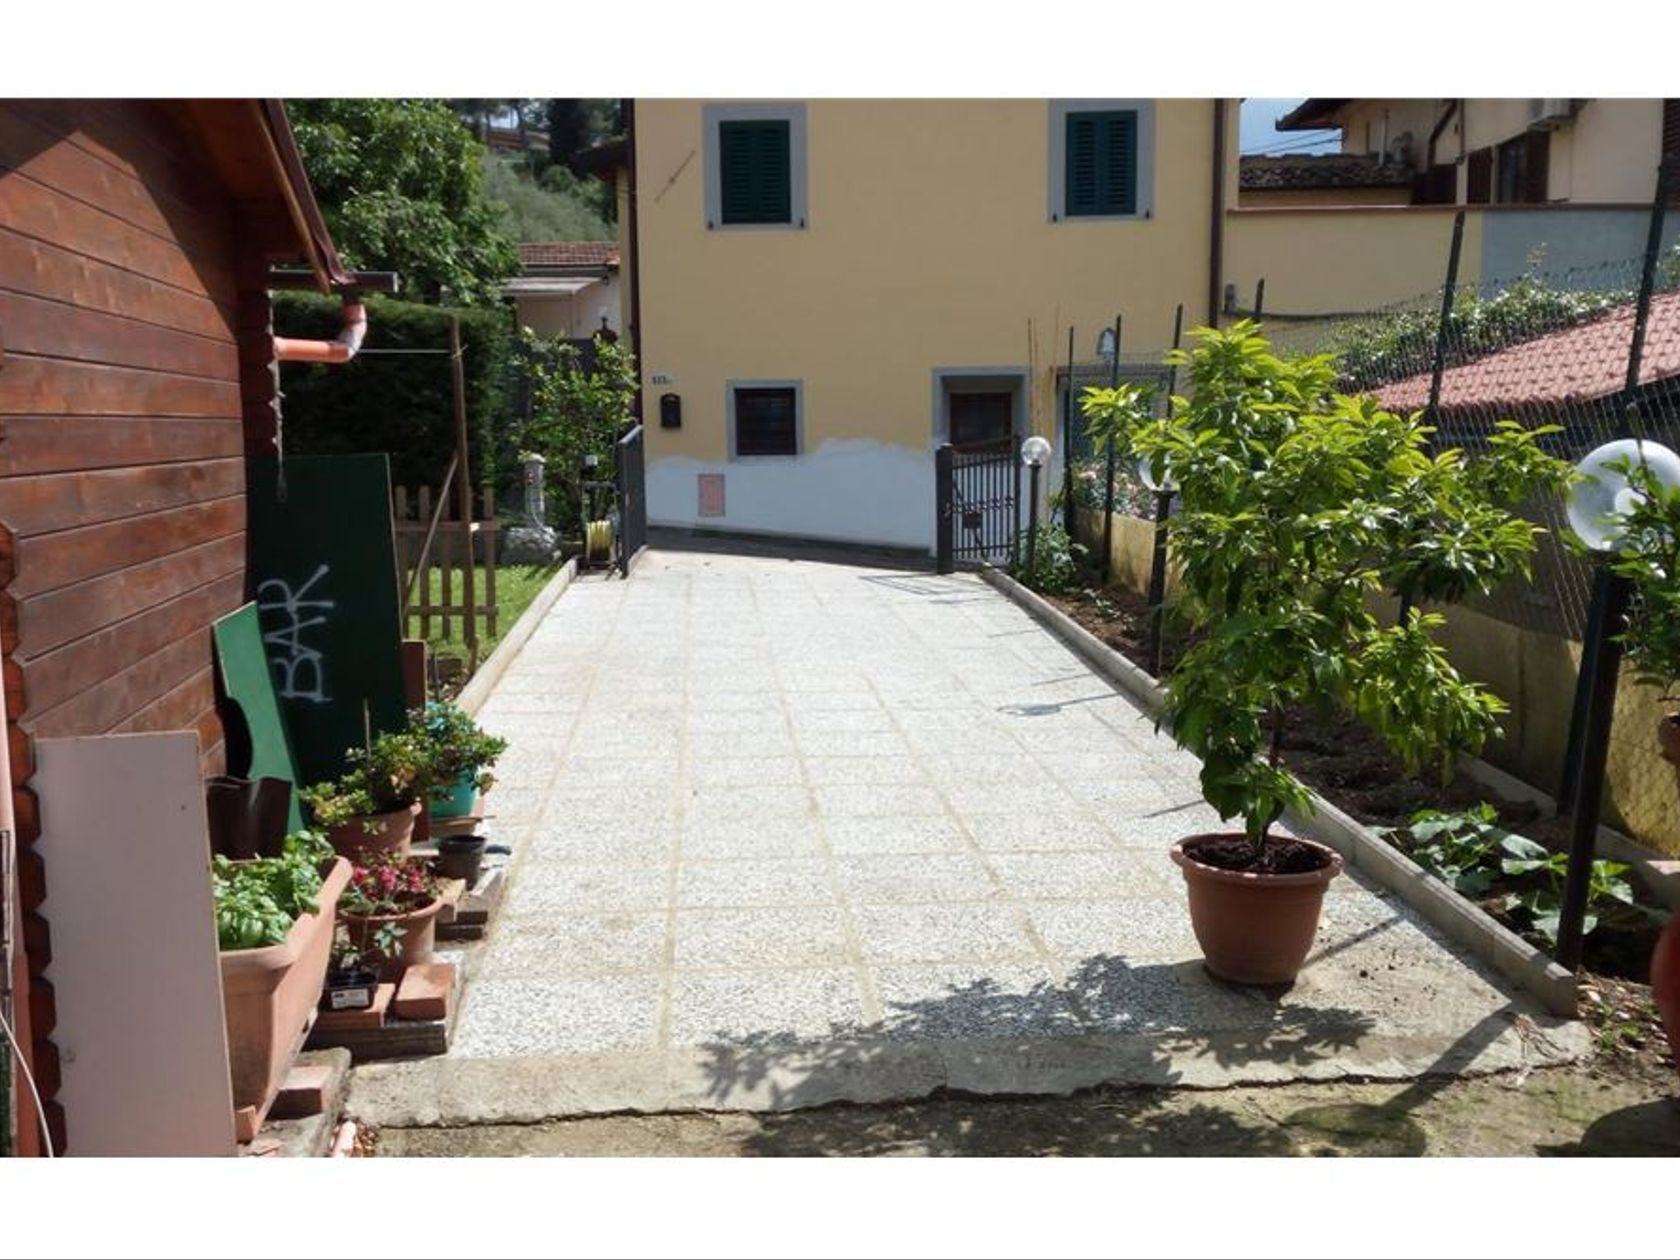 Appartamento Firenze - Firenze Sud Gavinana Europa, Firenze, FI Vendita - Foto 22